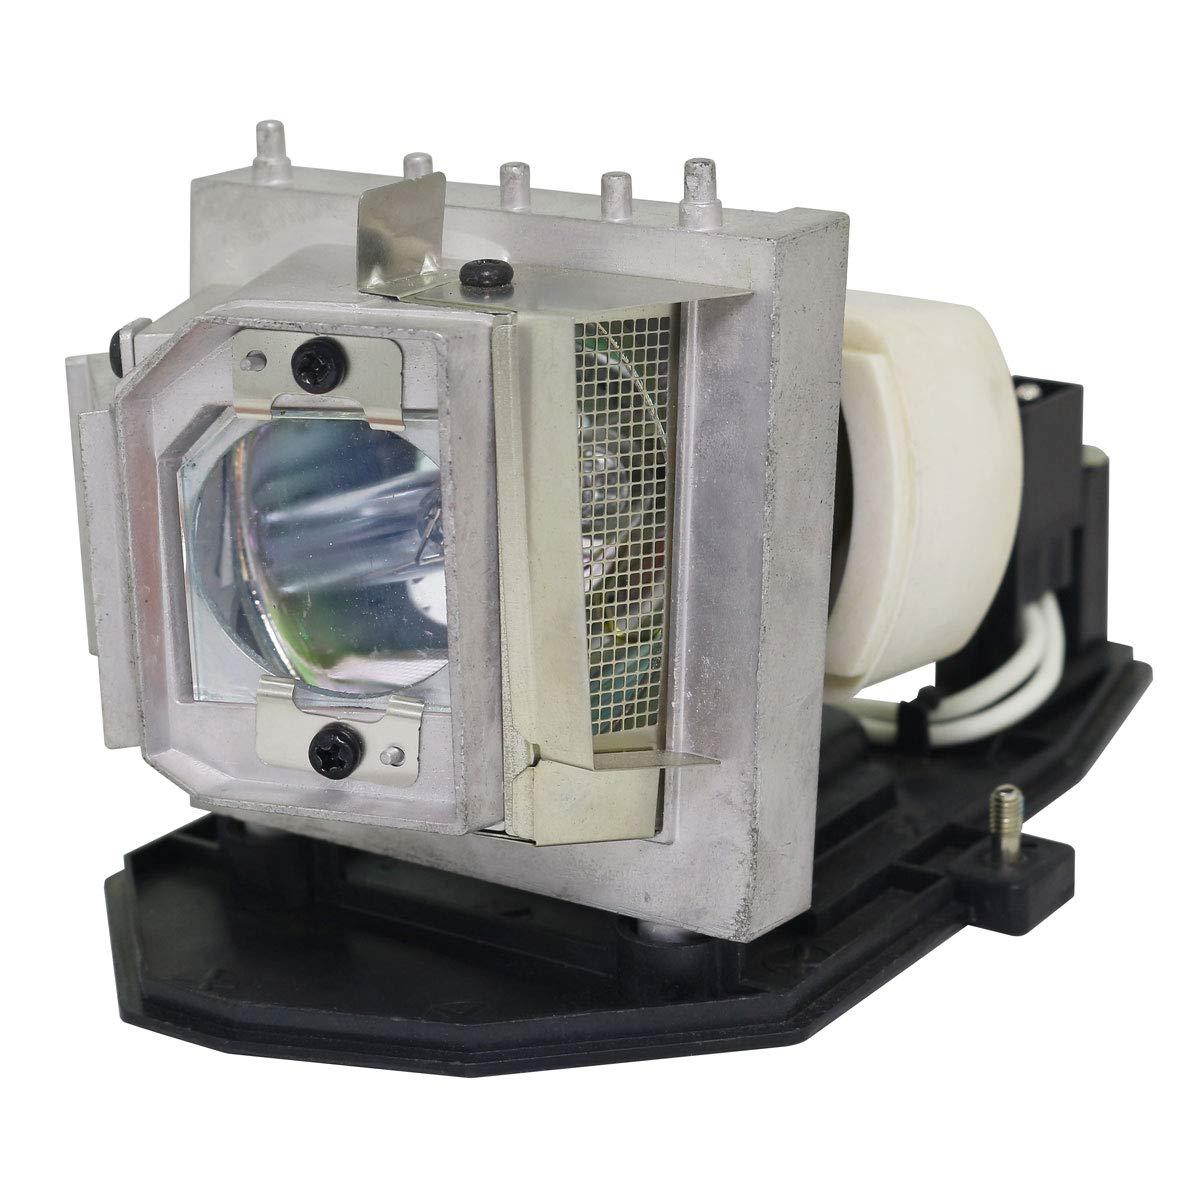 SpArc 交換用プロジェクターランプ 囲い/電球付き Acer H5370BD用 Platinum (Brighter/Durable) B07MPSMGVF Lamp with Housing Platinum (Brighter/Durable)